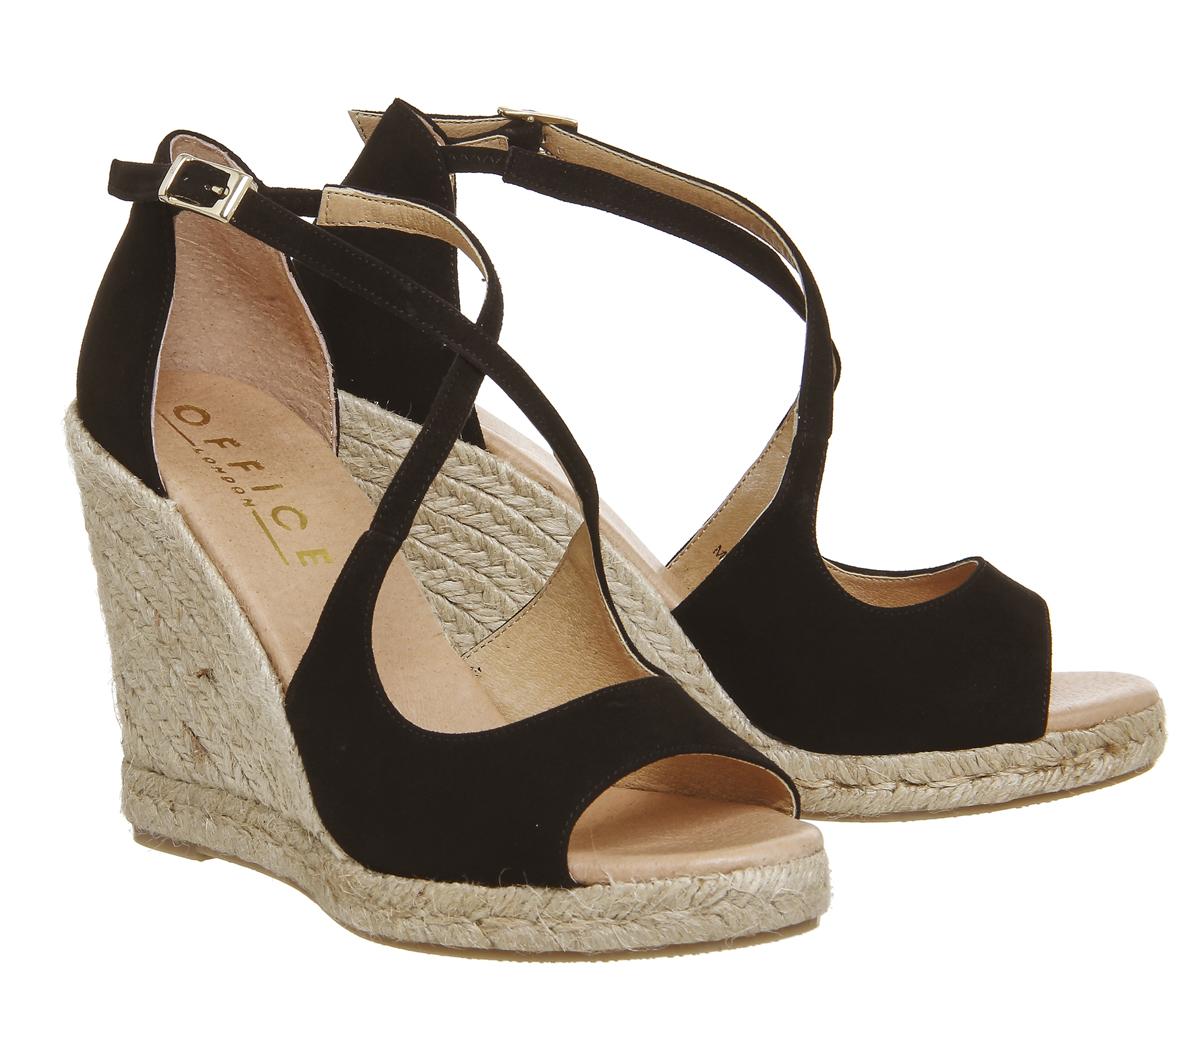 f7329953111 Details about Womens Office Halkidiki Espadrille Wedges BLACK SUEDE Heels